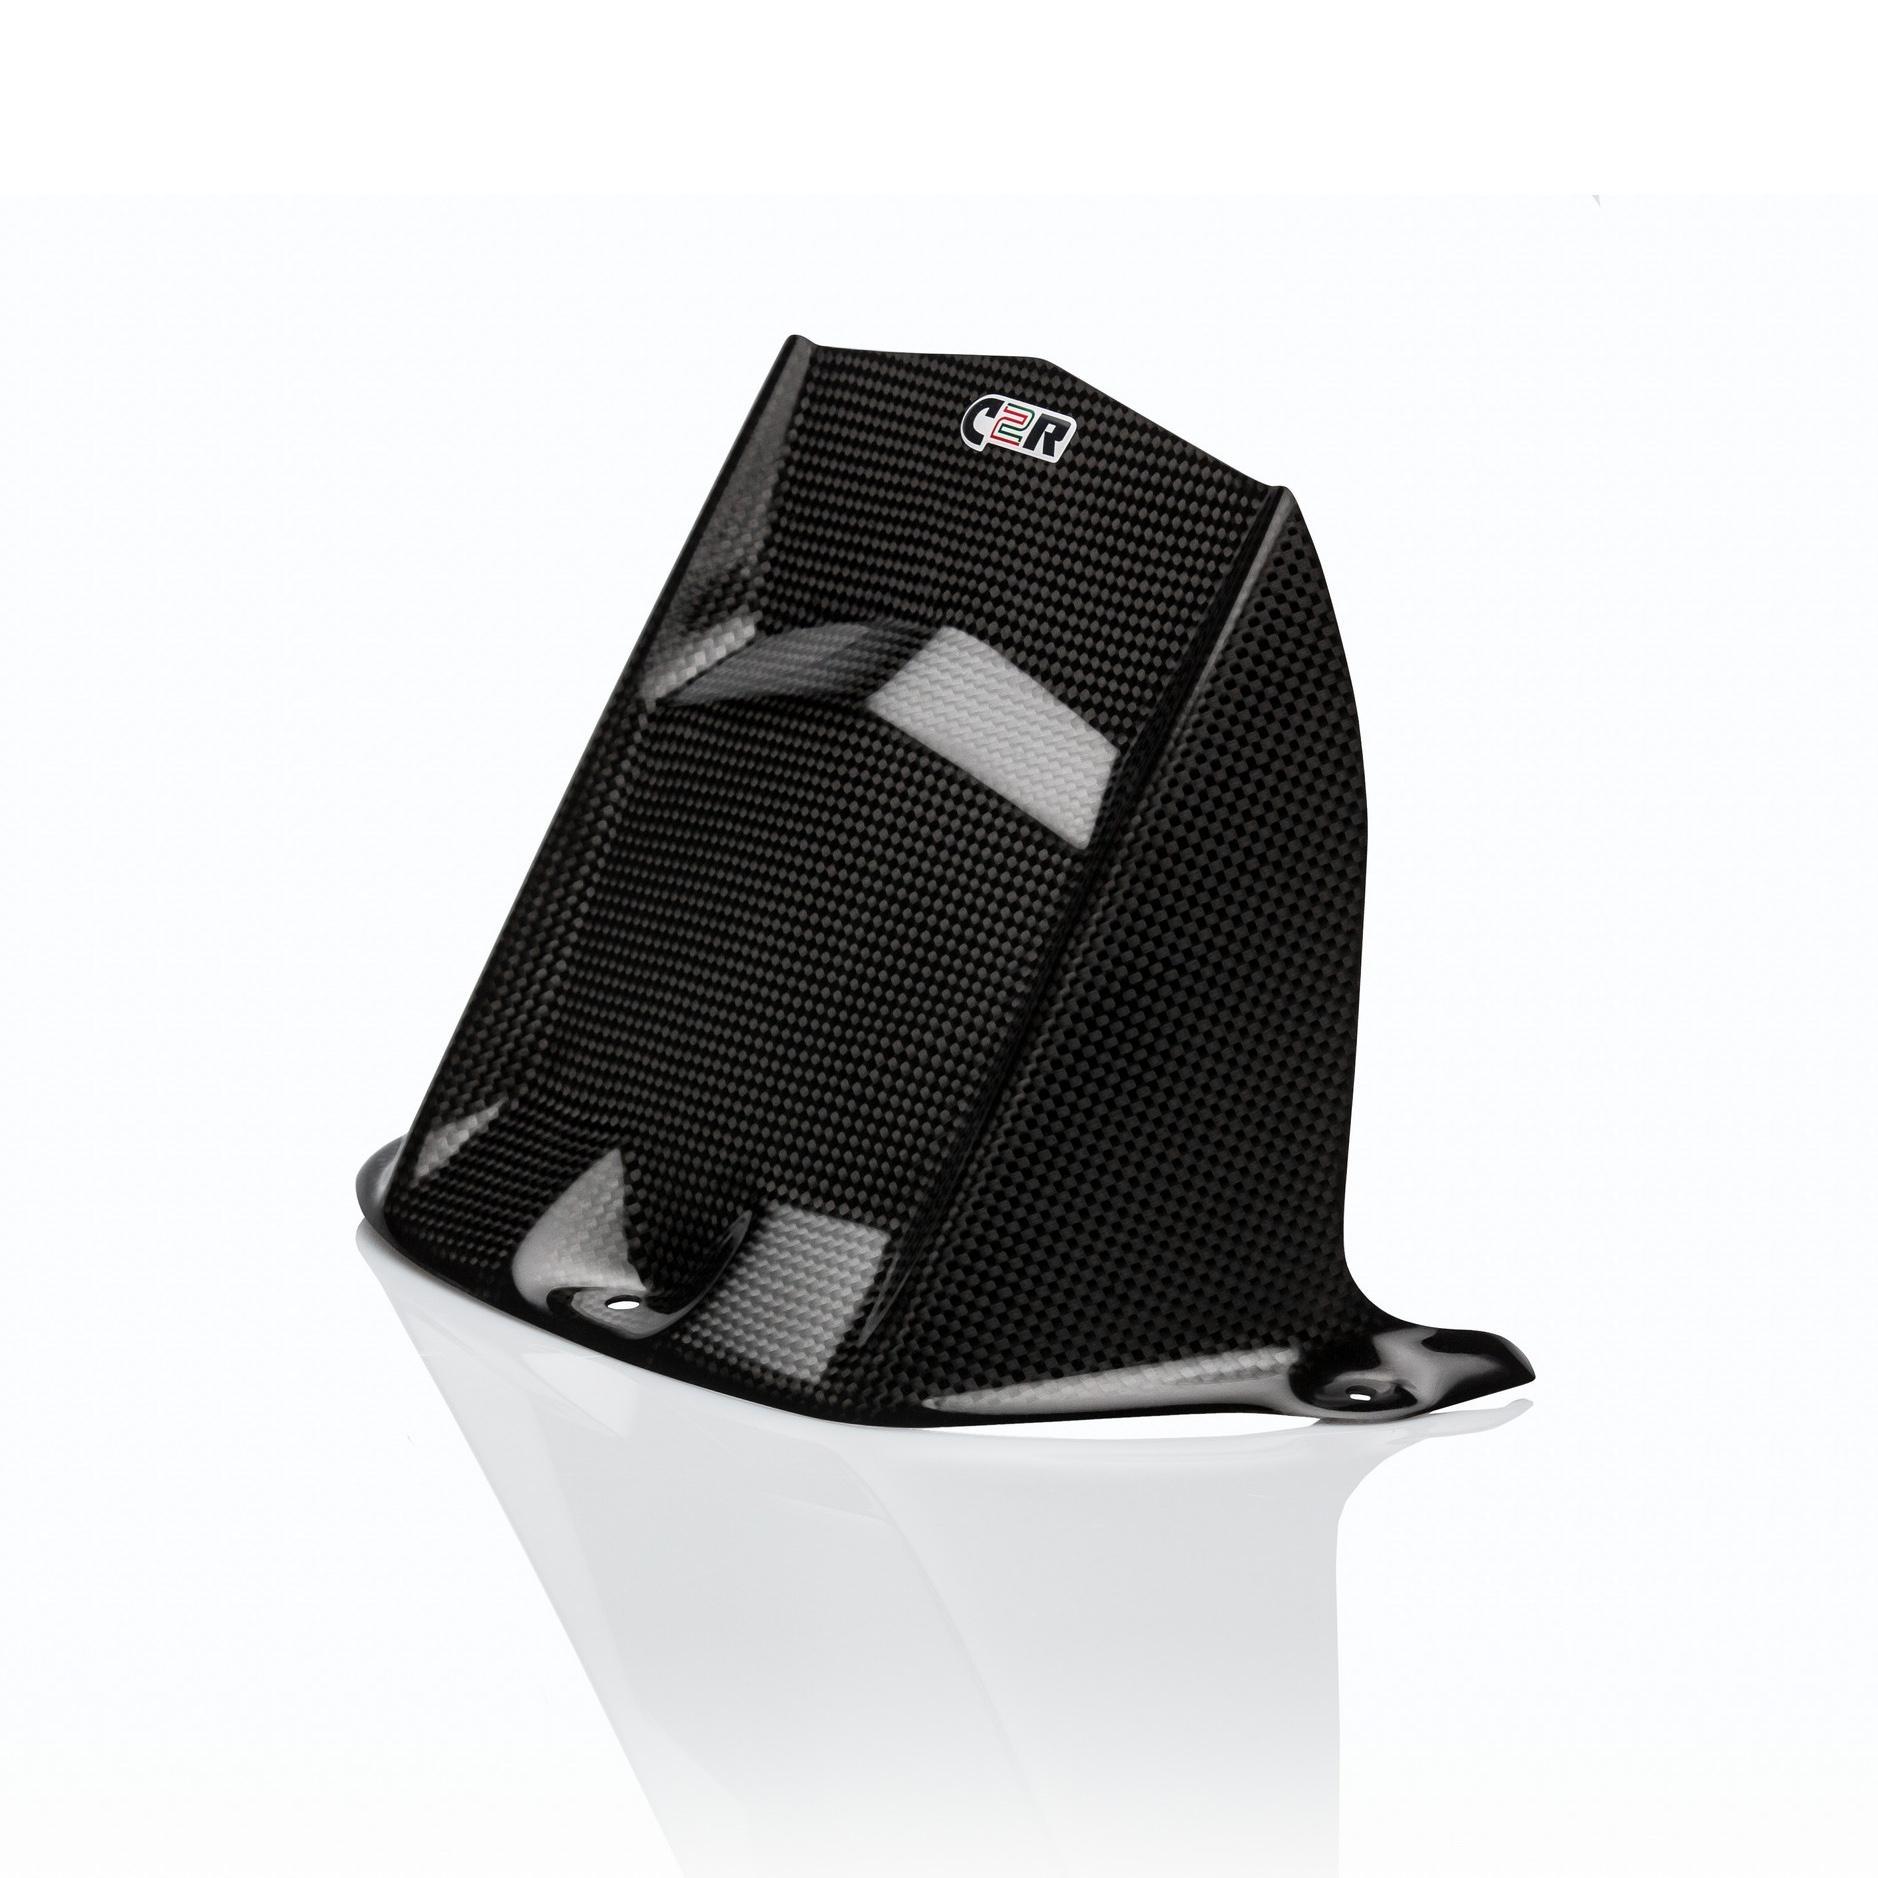 YAMAHA YZF-R6 2006-2016 Carbon Fiber Rear Hugger